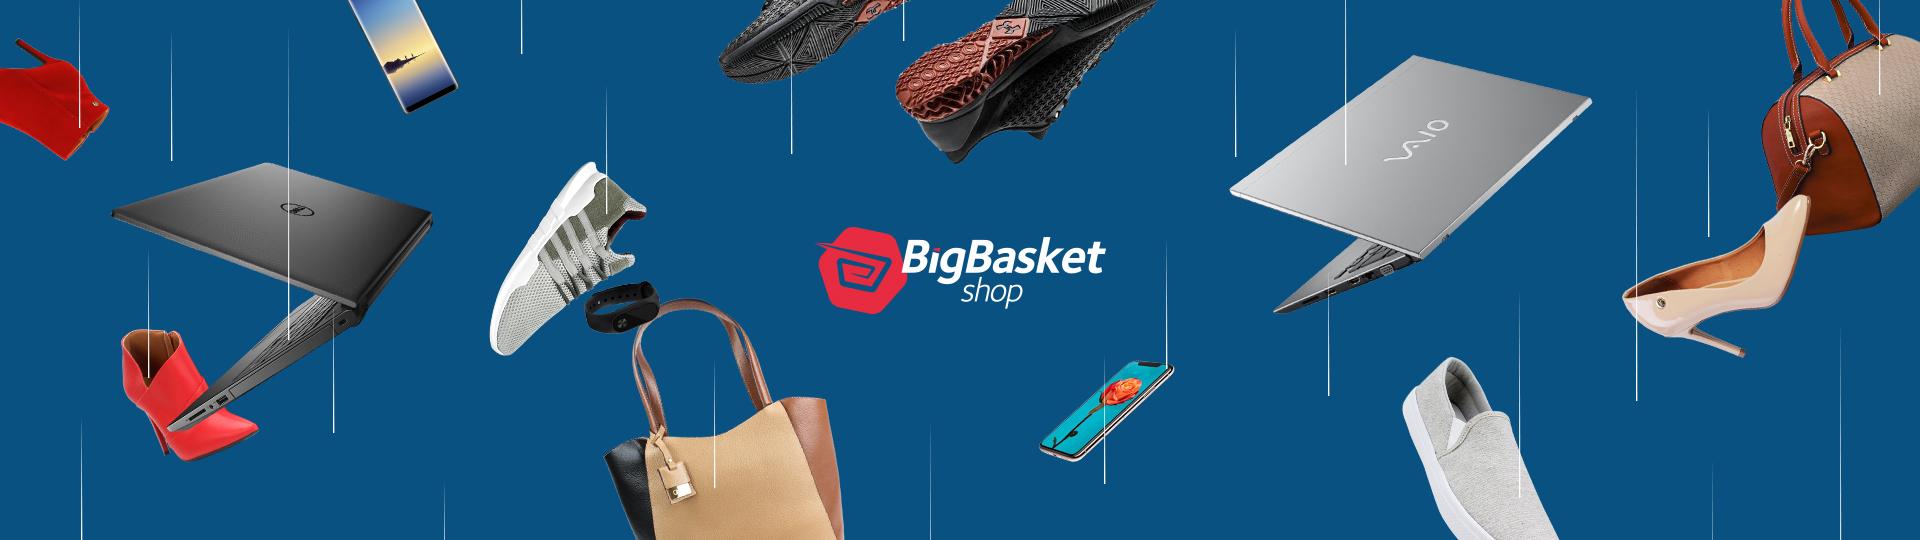 https://www.agencialewe.com.br/wp-content/uploads/2019/06/capa_bigbasket.jpg